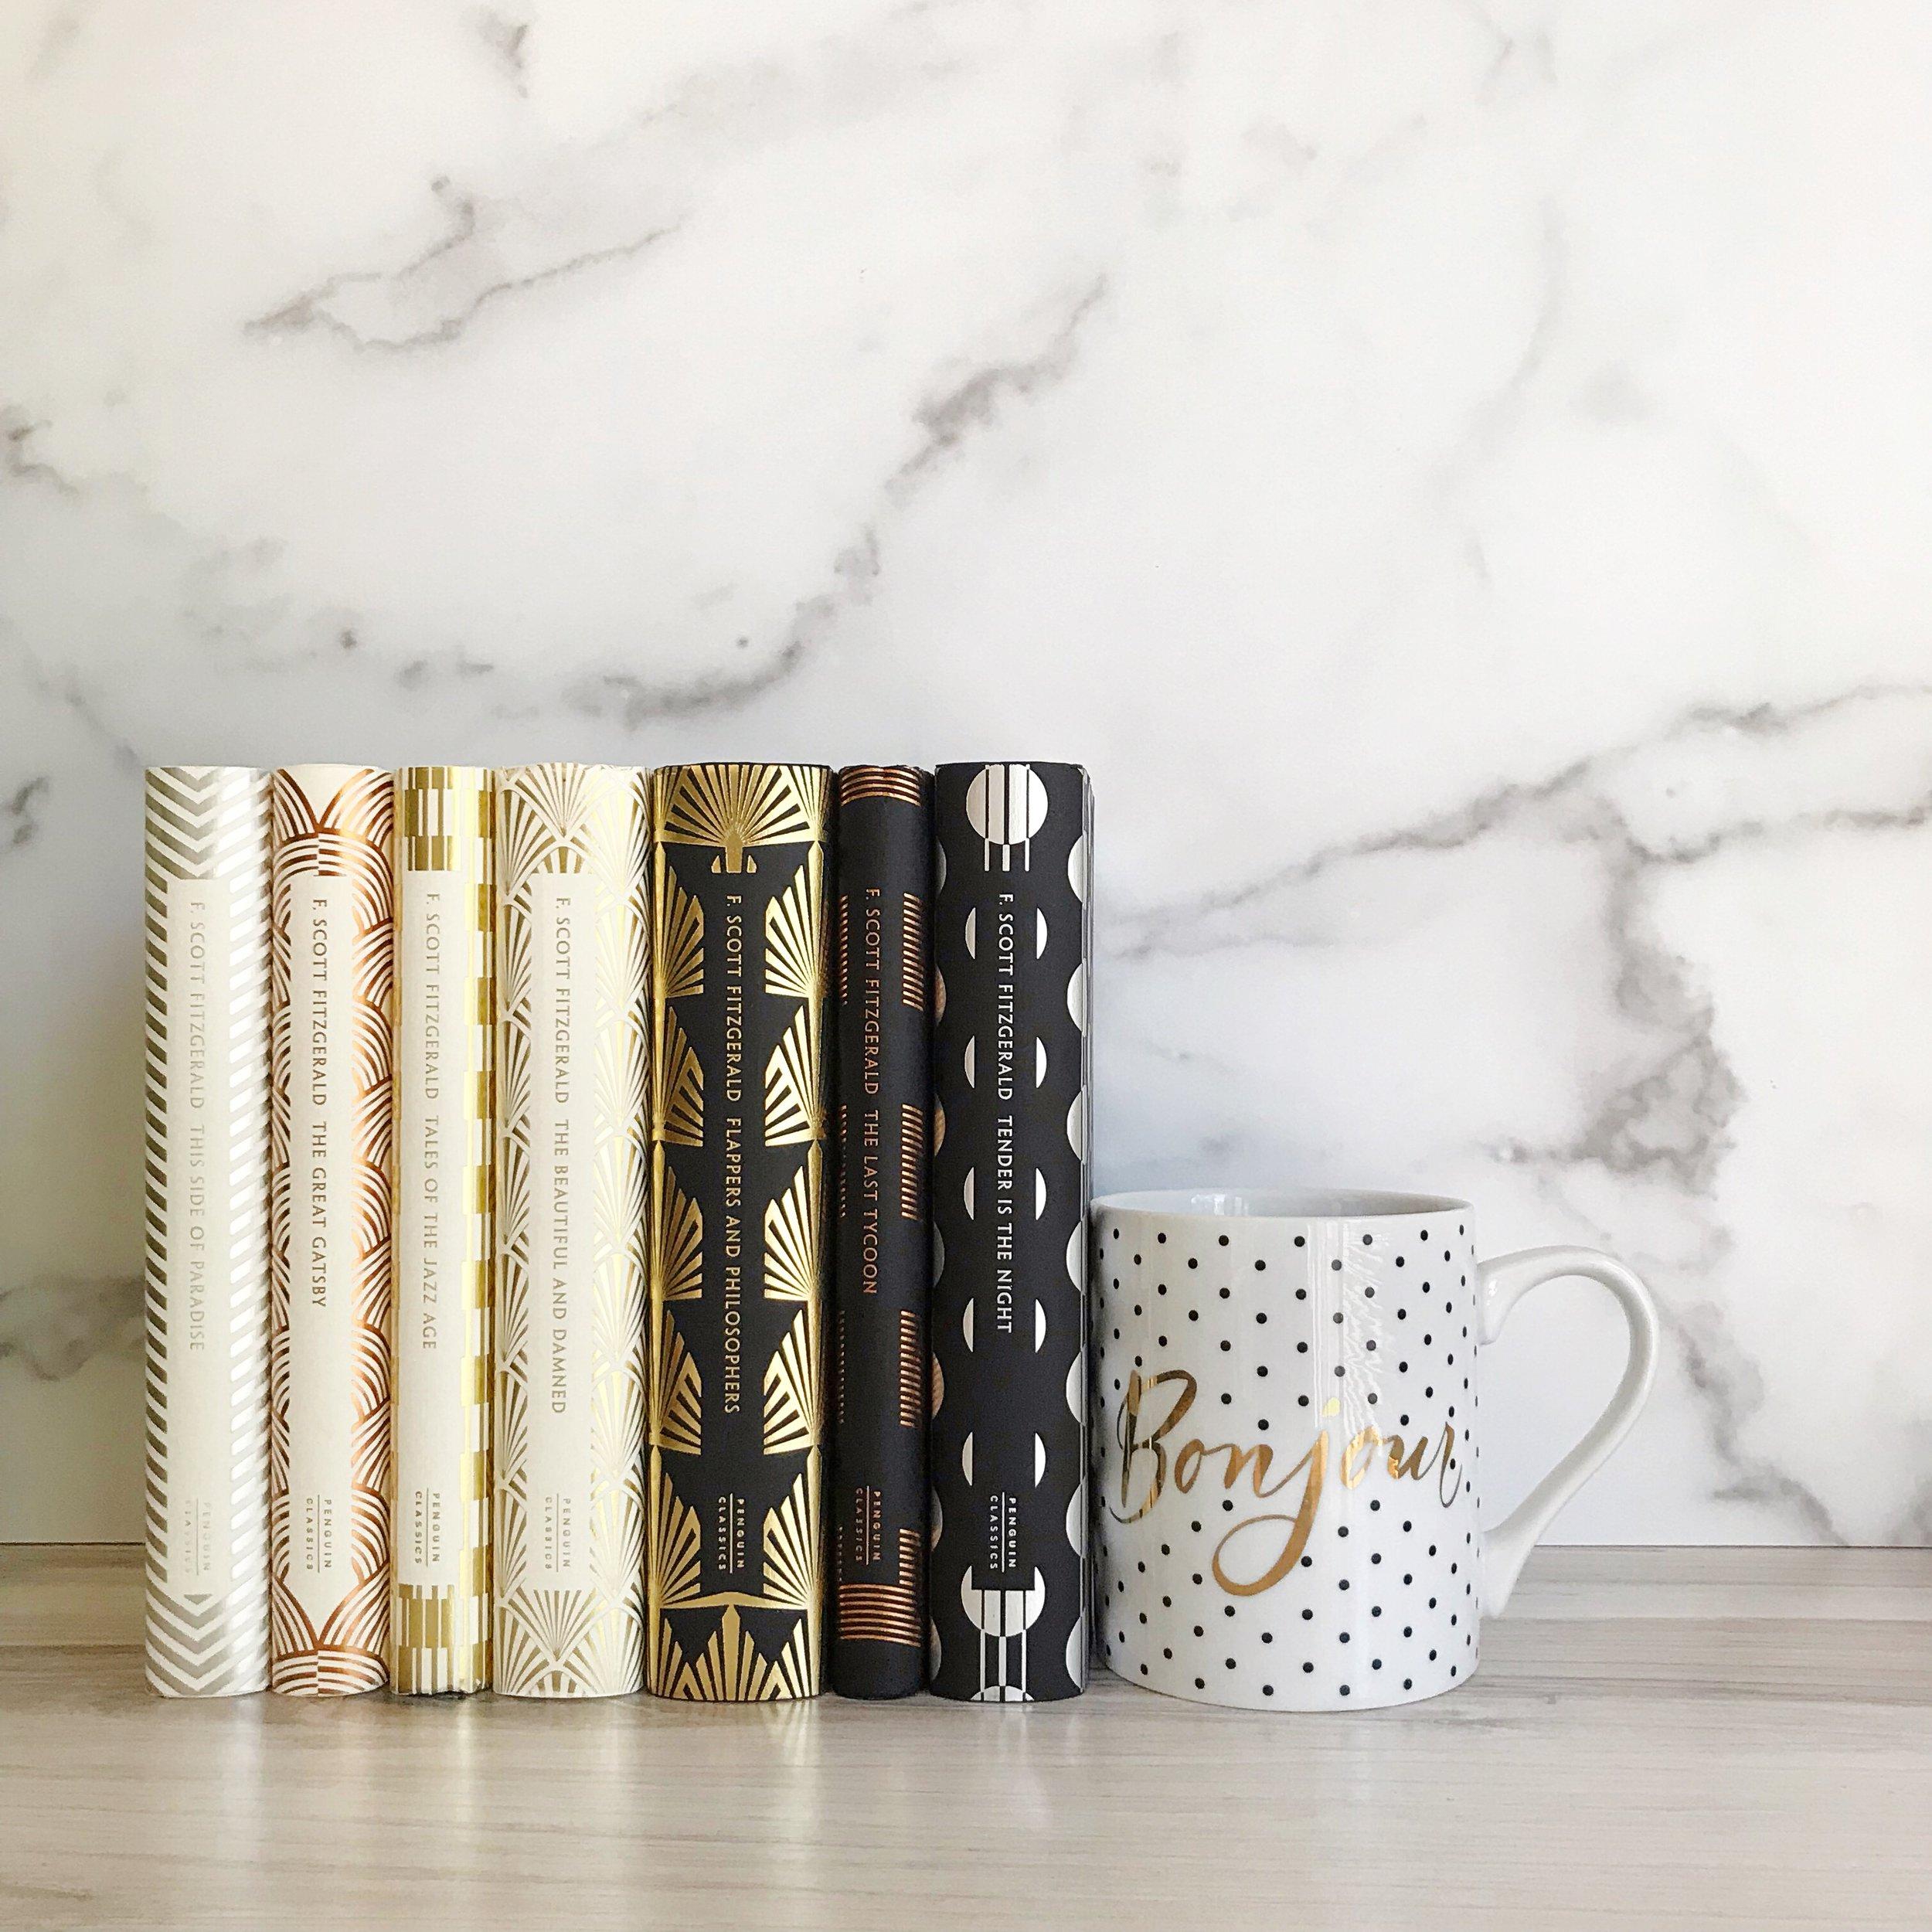 Penguin F. Scott Fitzgerald Hardback Collection -